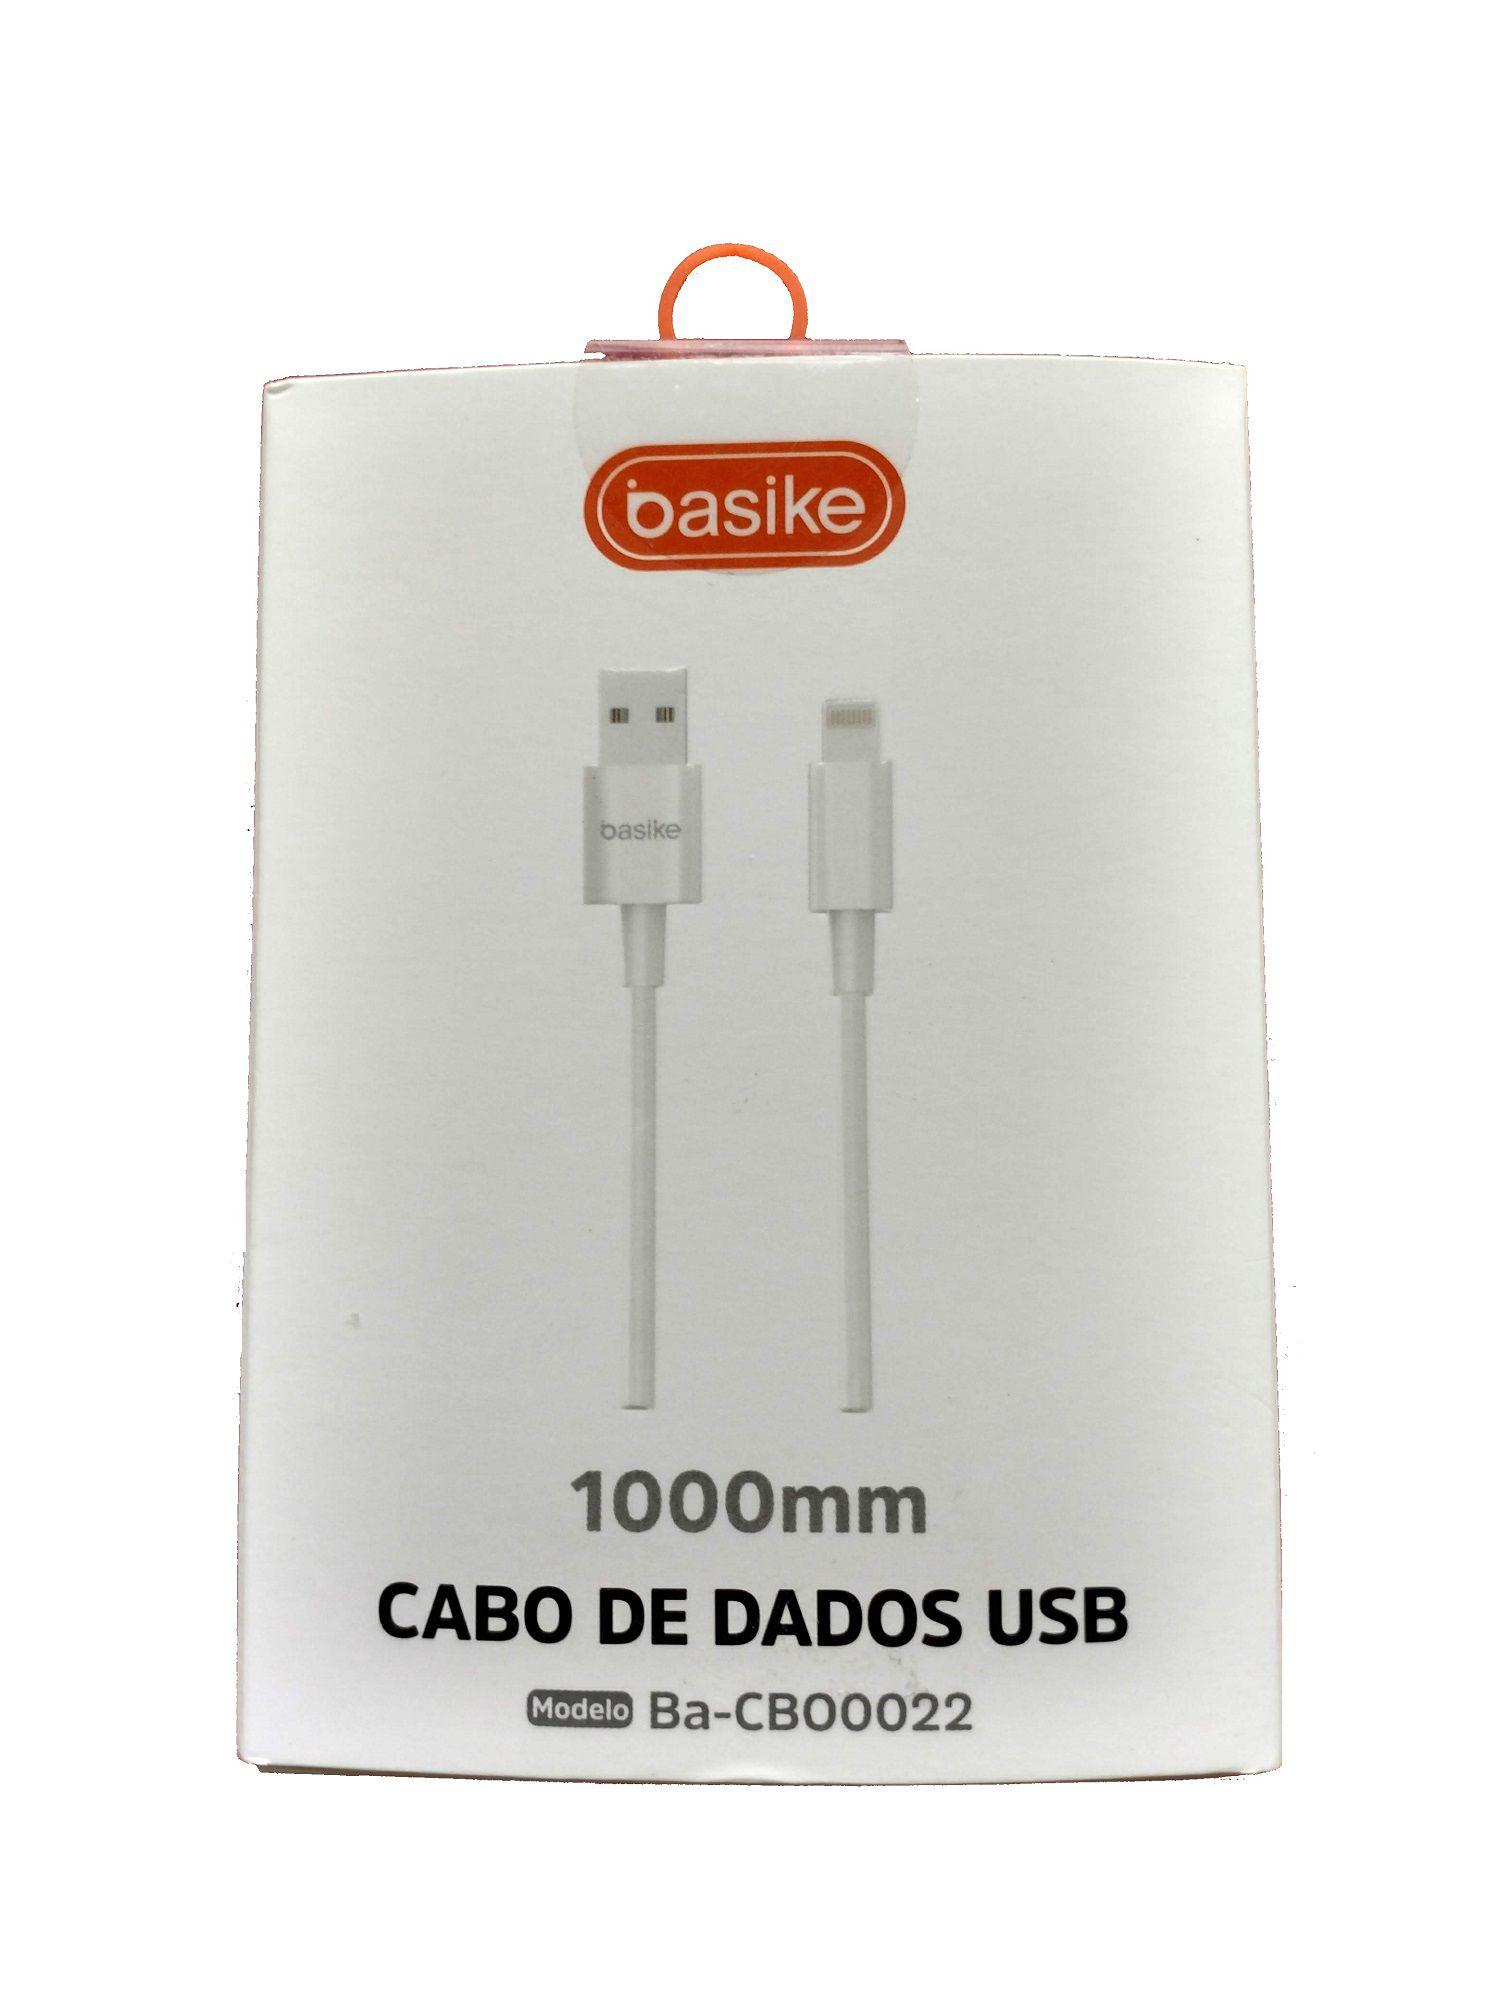 CABO DE DADOS, APPLE IPHONE 5 6 7, 8, BRANCO BASIKE, 1 M